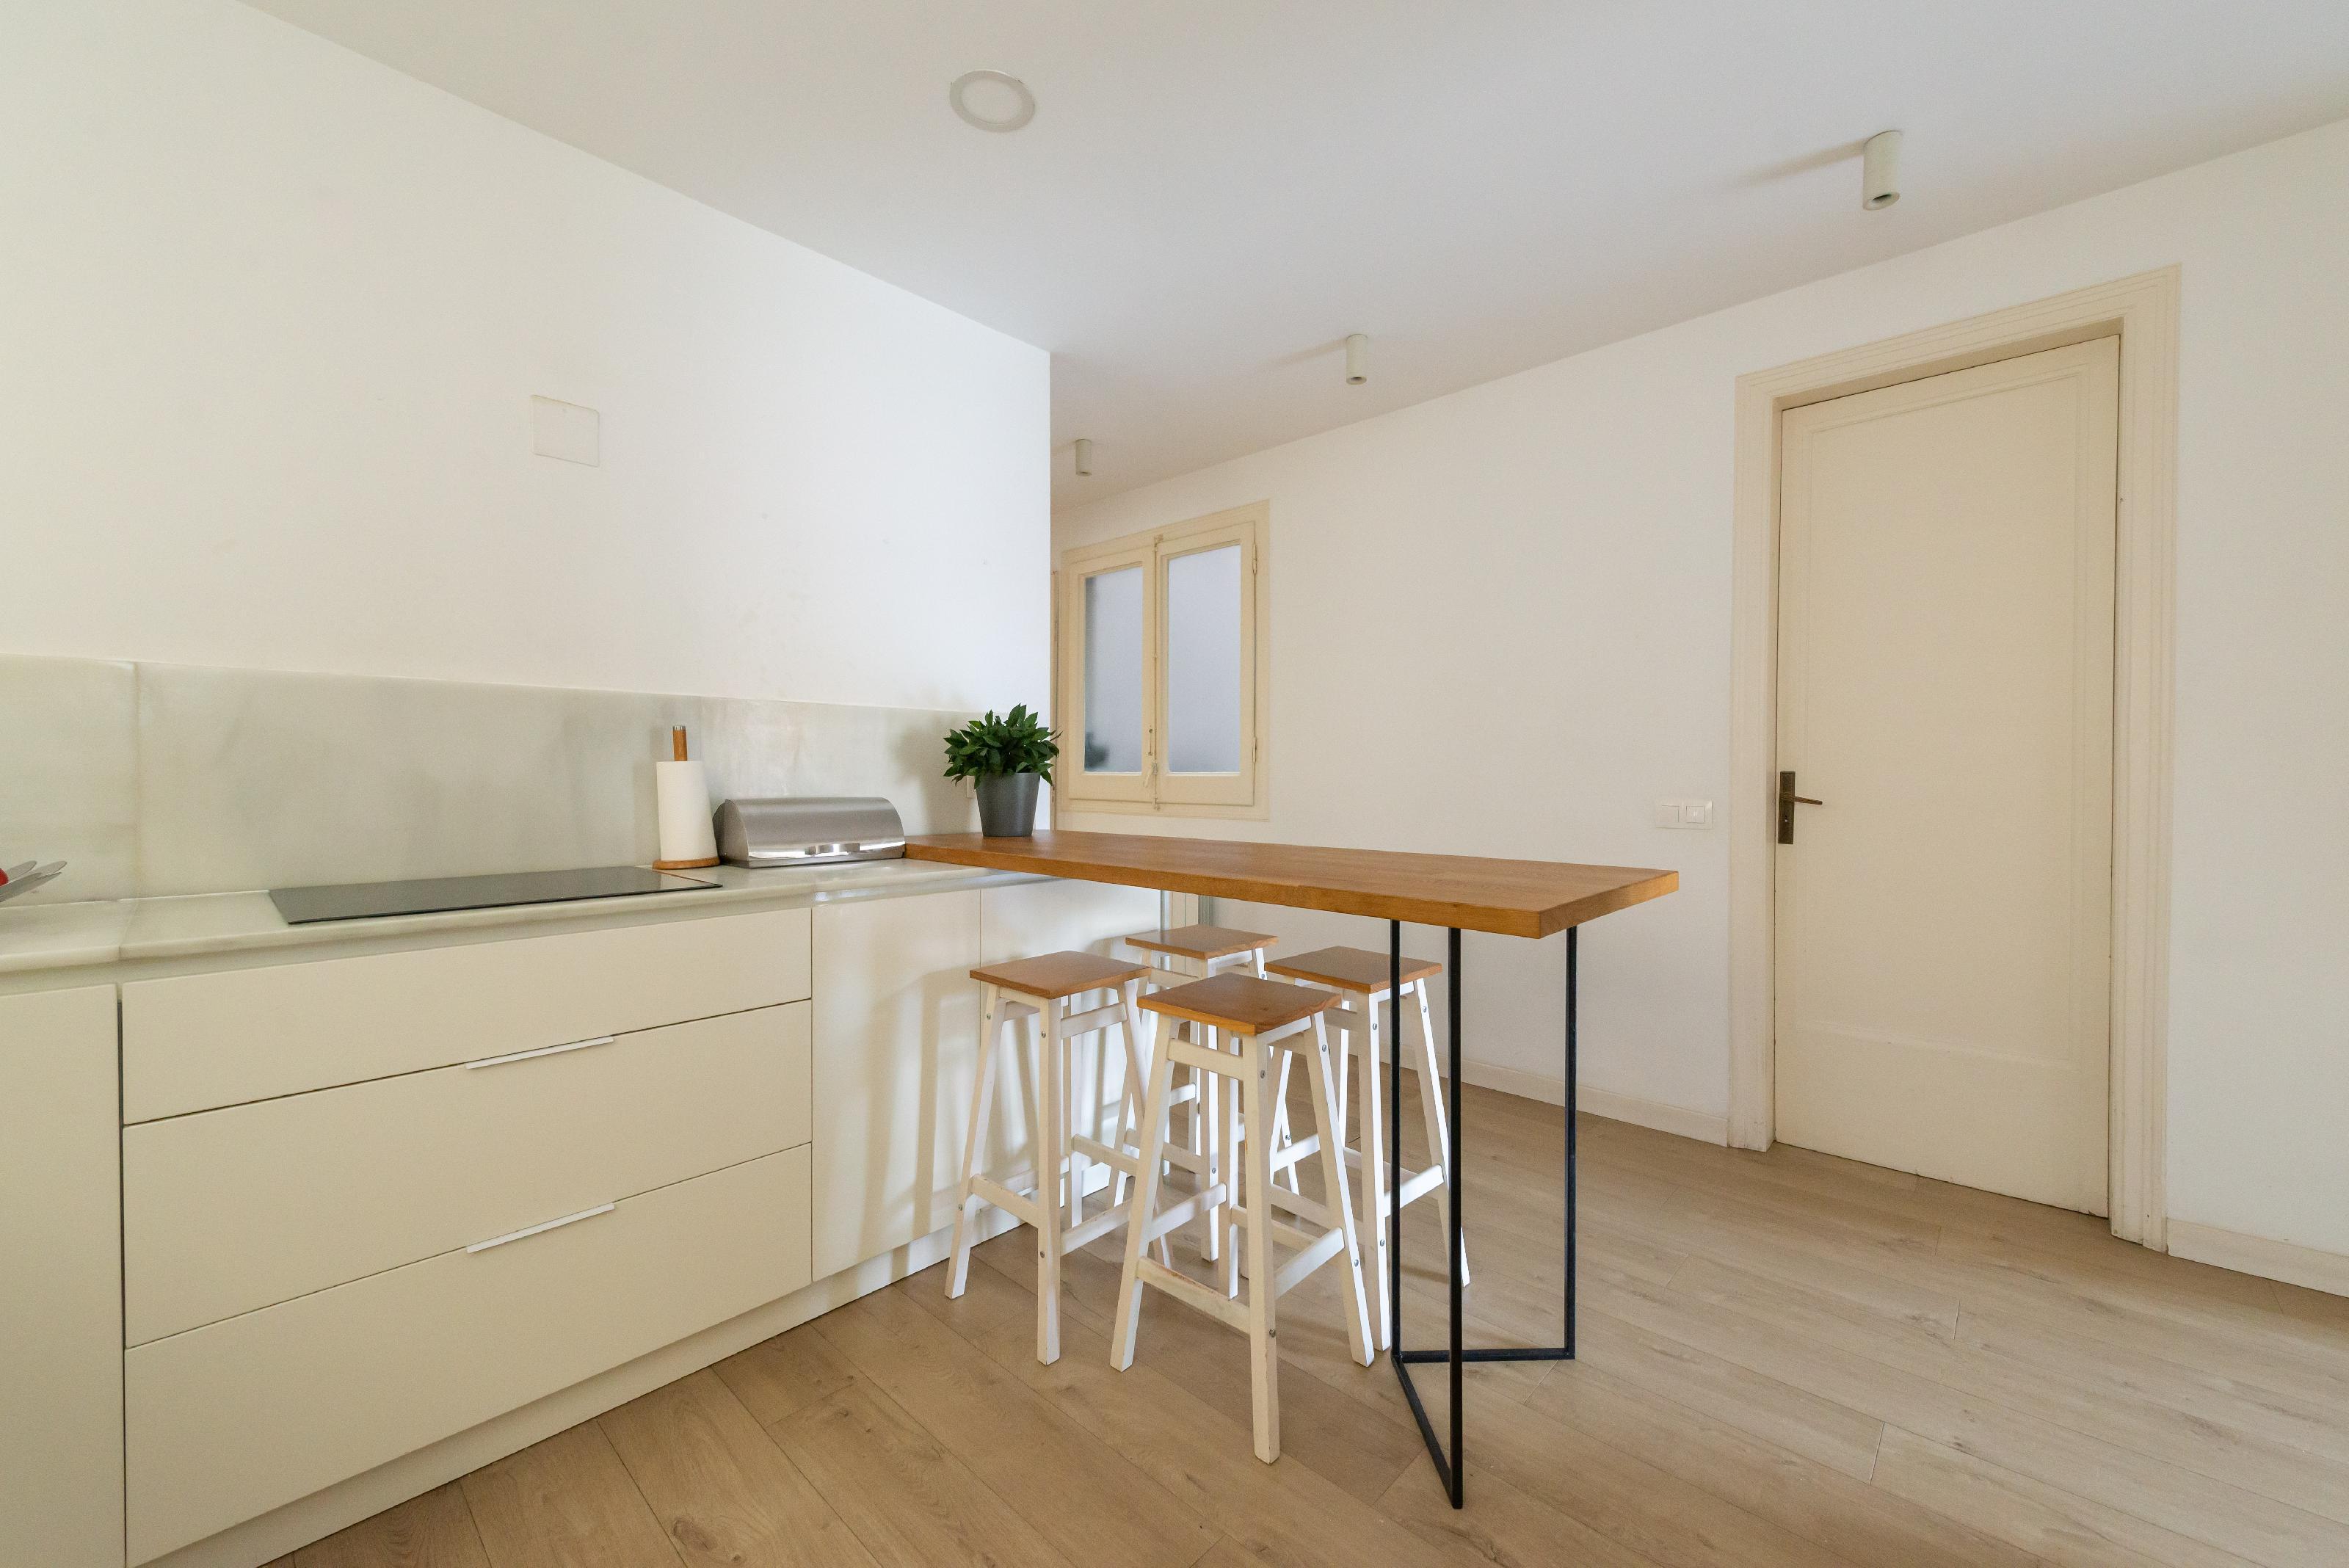 250005 Flat for sale in Sarrià-Sant Gervasi, Sant Gervasi-Galvany 21